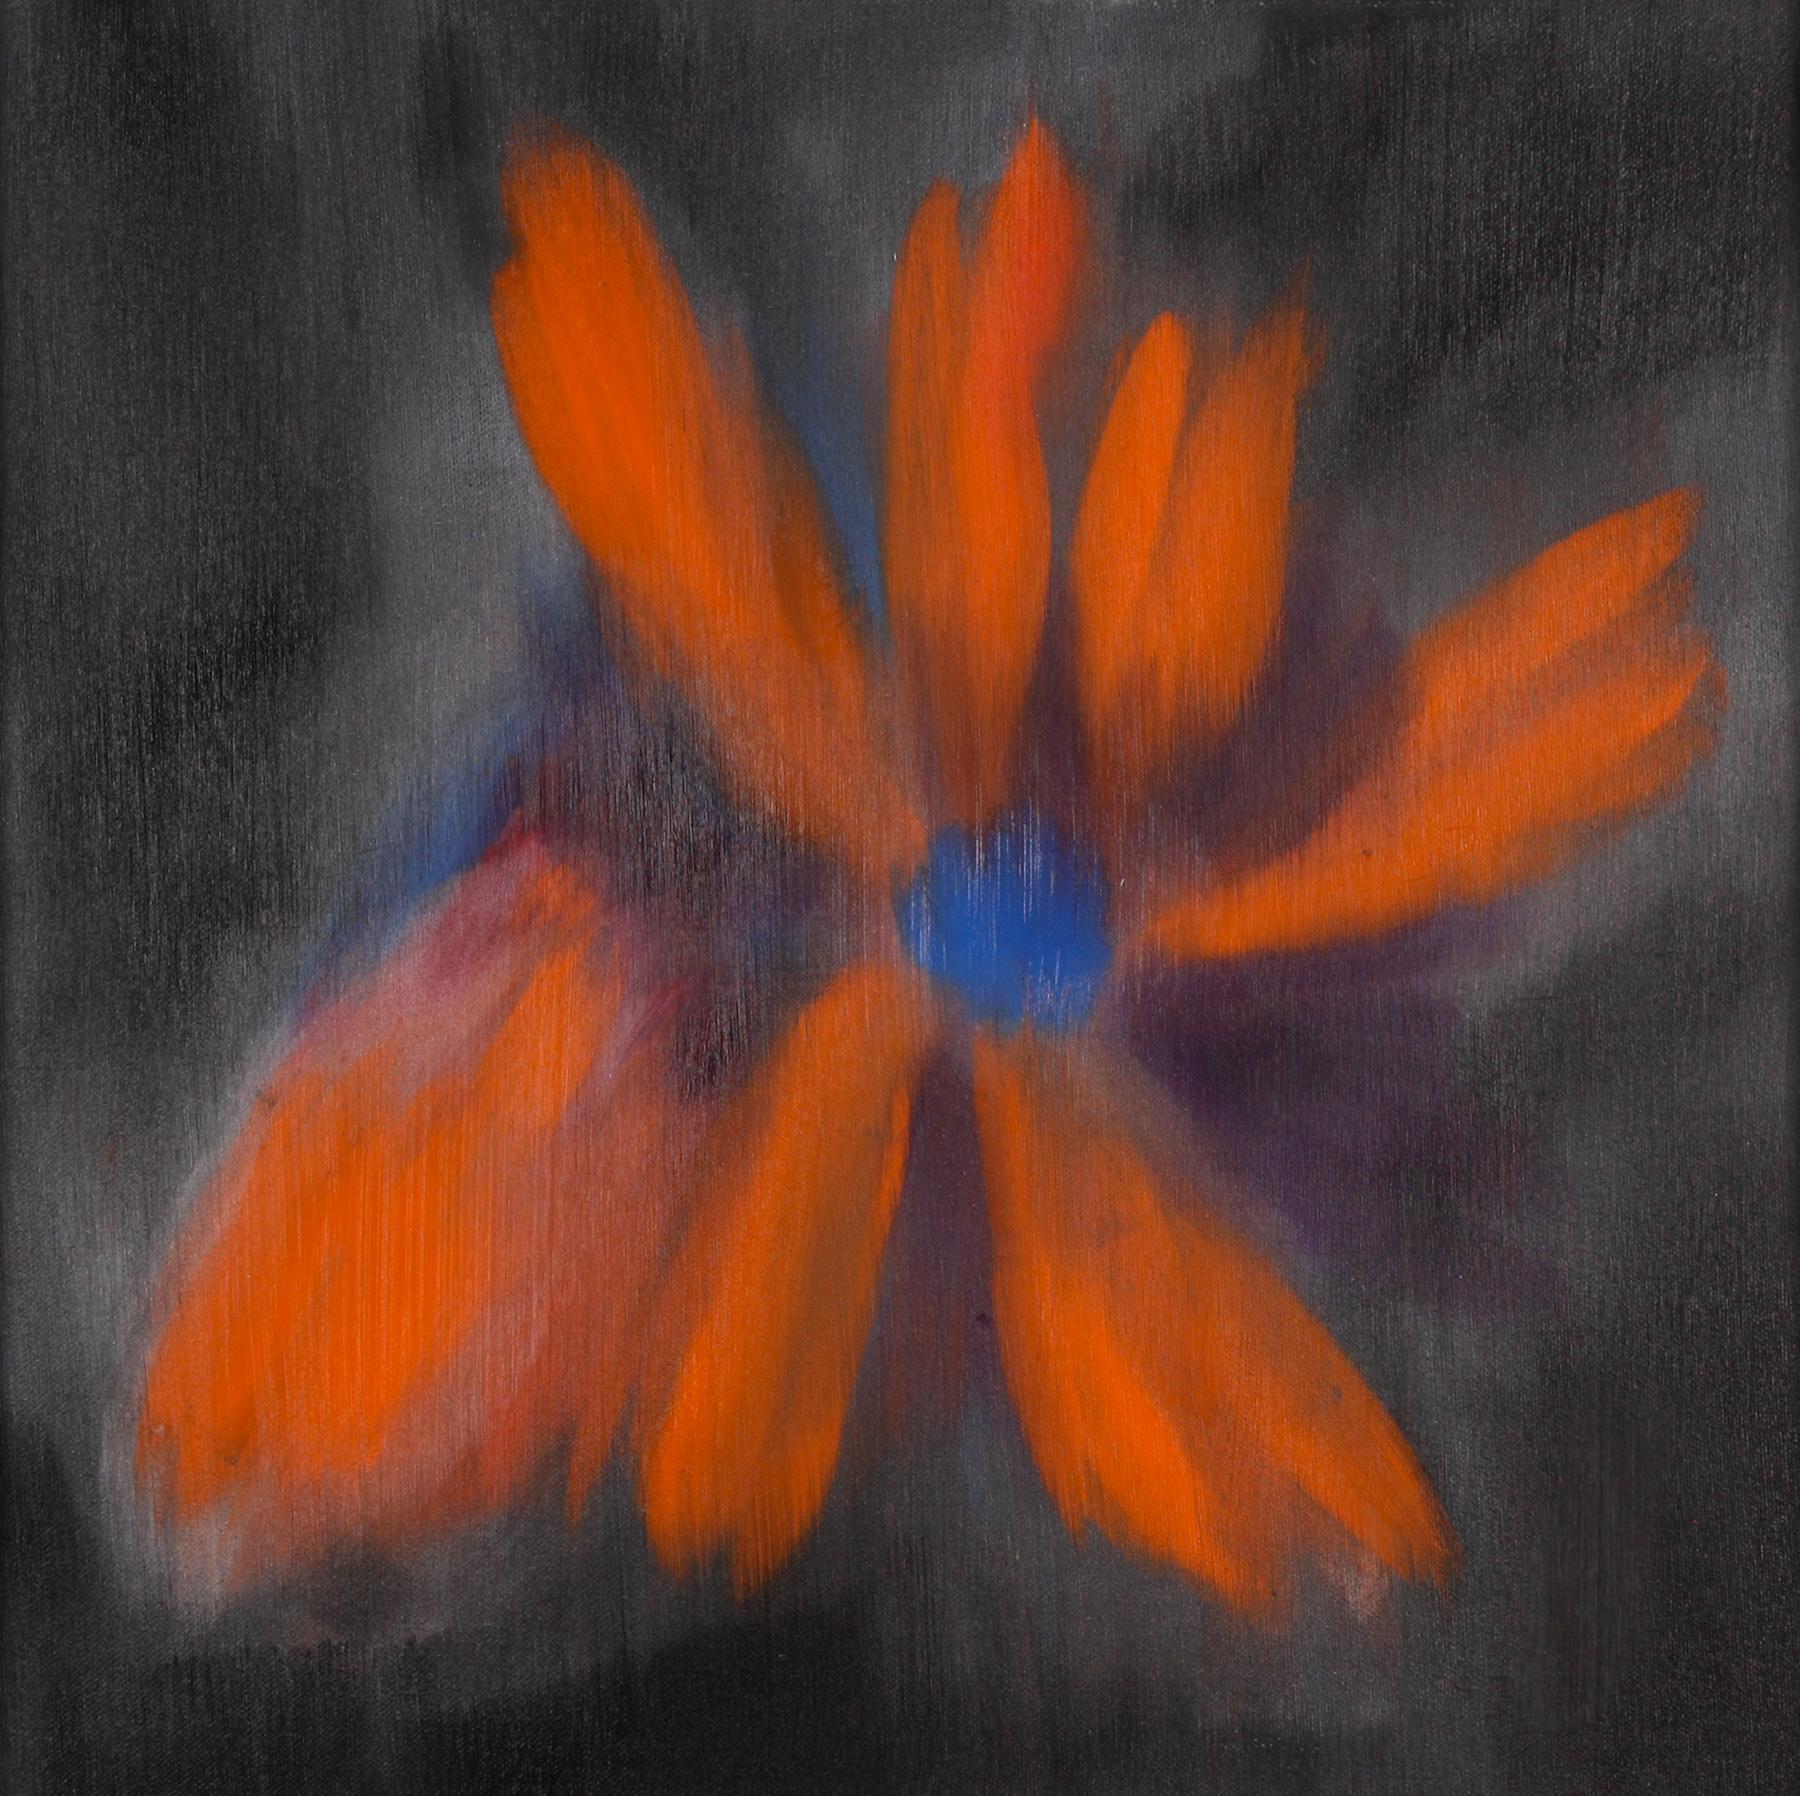 Ross Bleckner,  Untitled  2009 18 x 18 in Oil on canvas